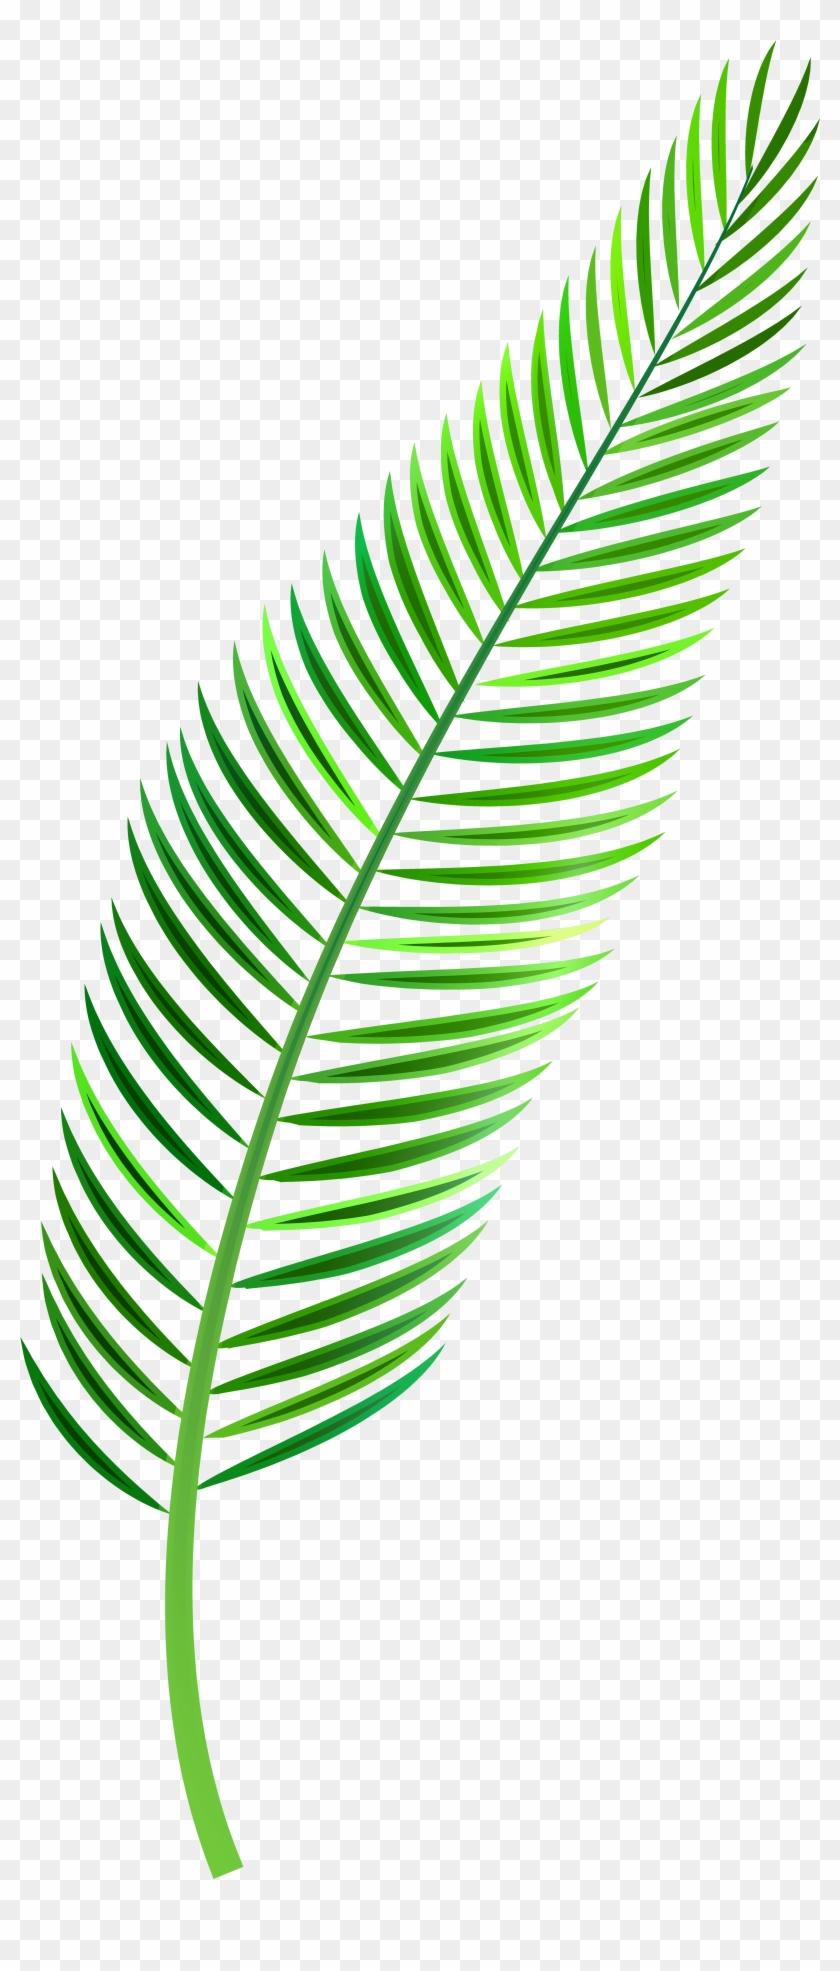 Palm Leaf Png Clip Art.